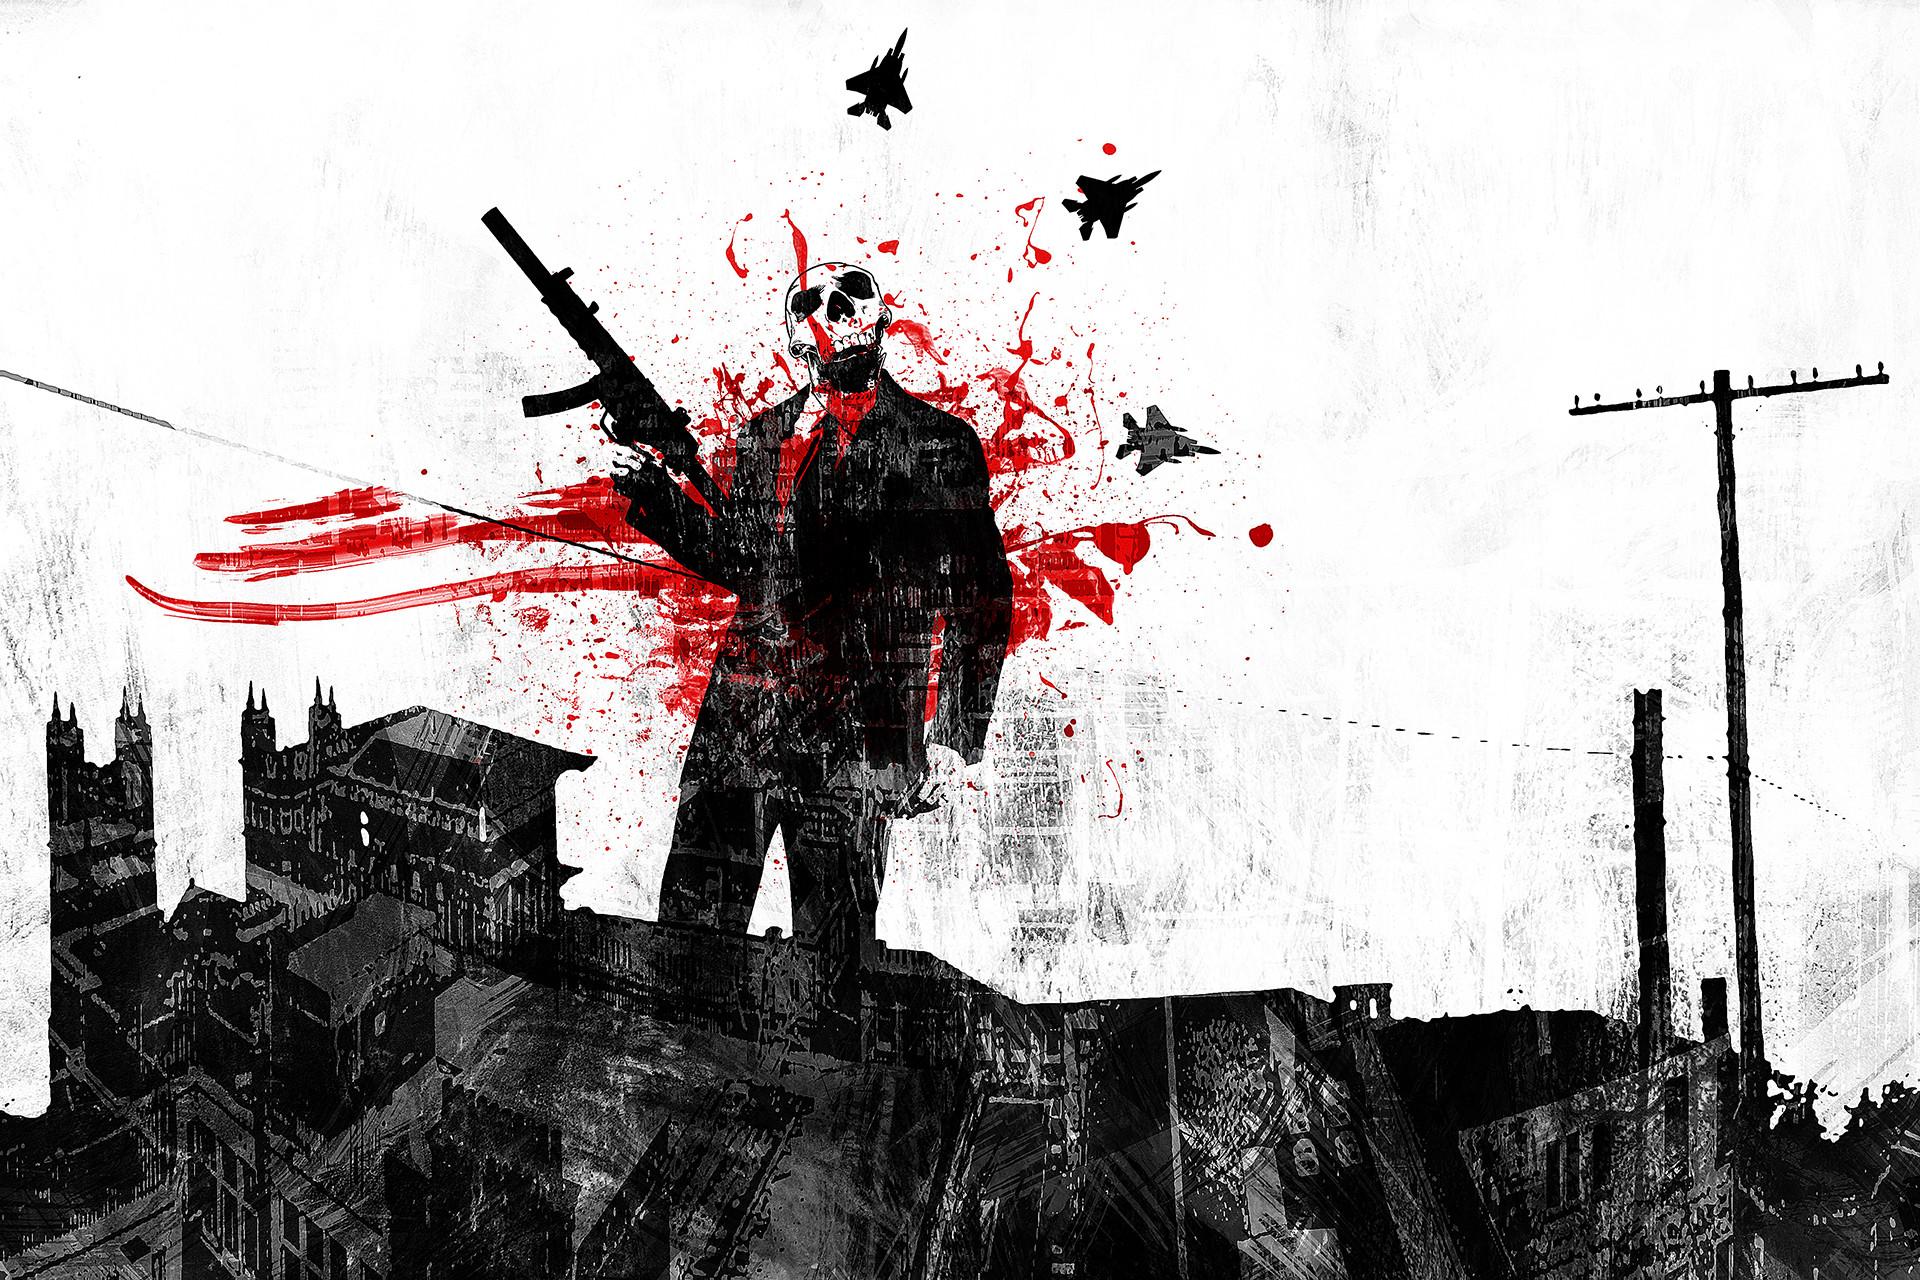 F4lc0n-6_deviantart_com political dark anarchy skulls war blood cities  weapons hyorror macabre wallpaper | | 22442 | WallpaperUP